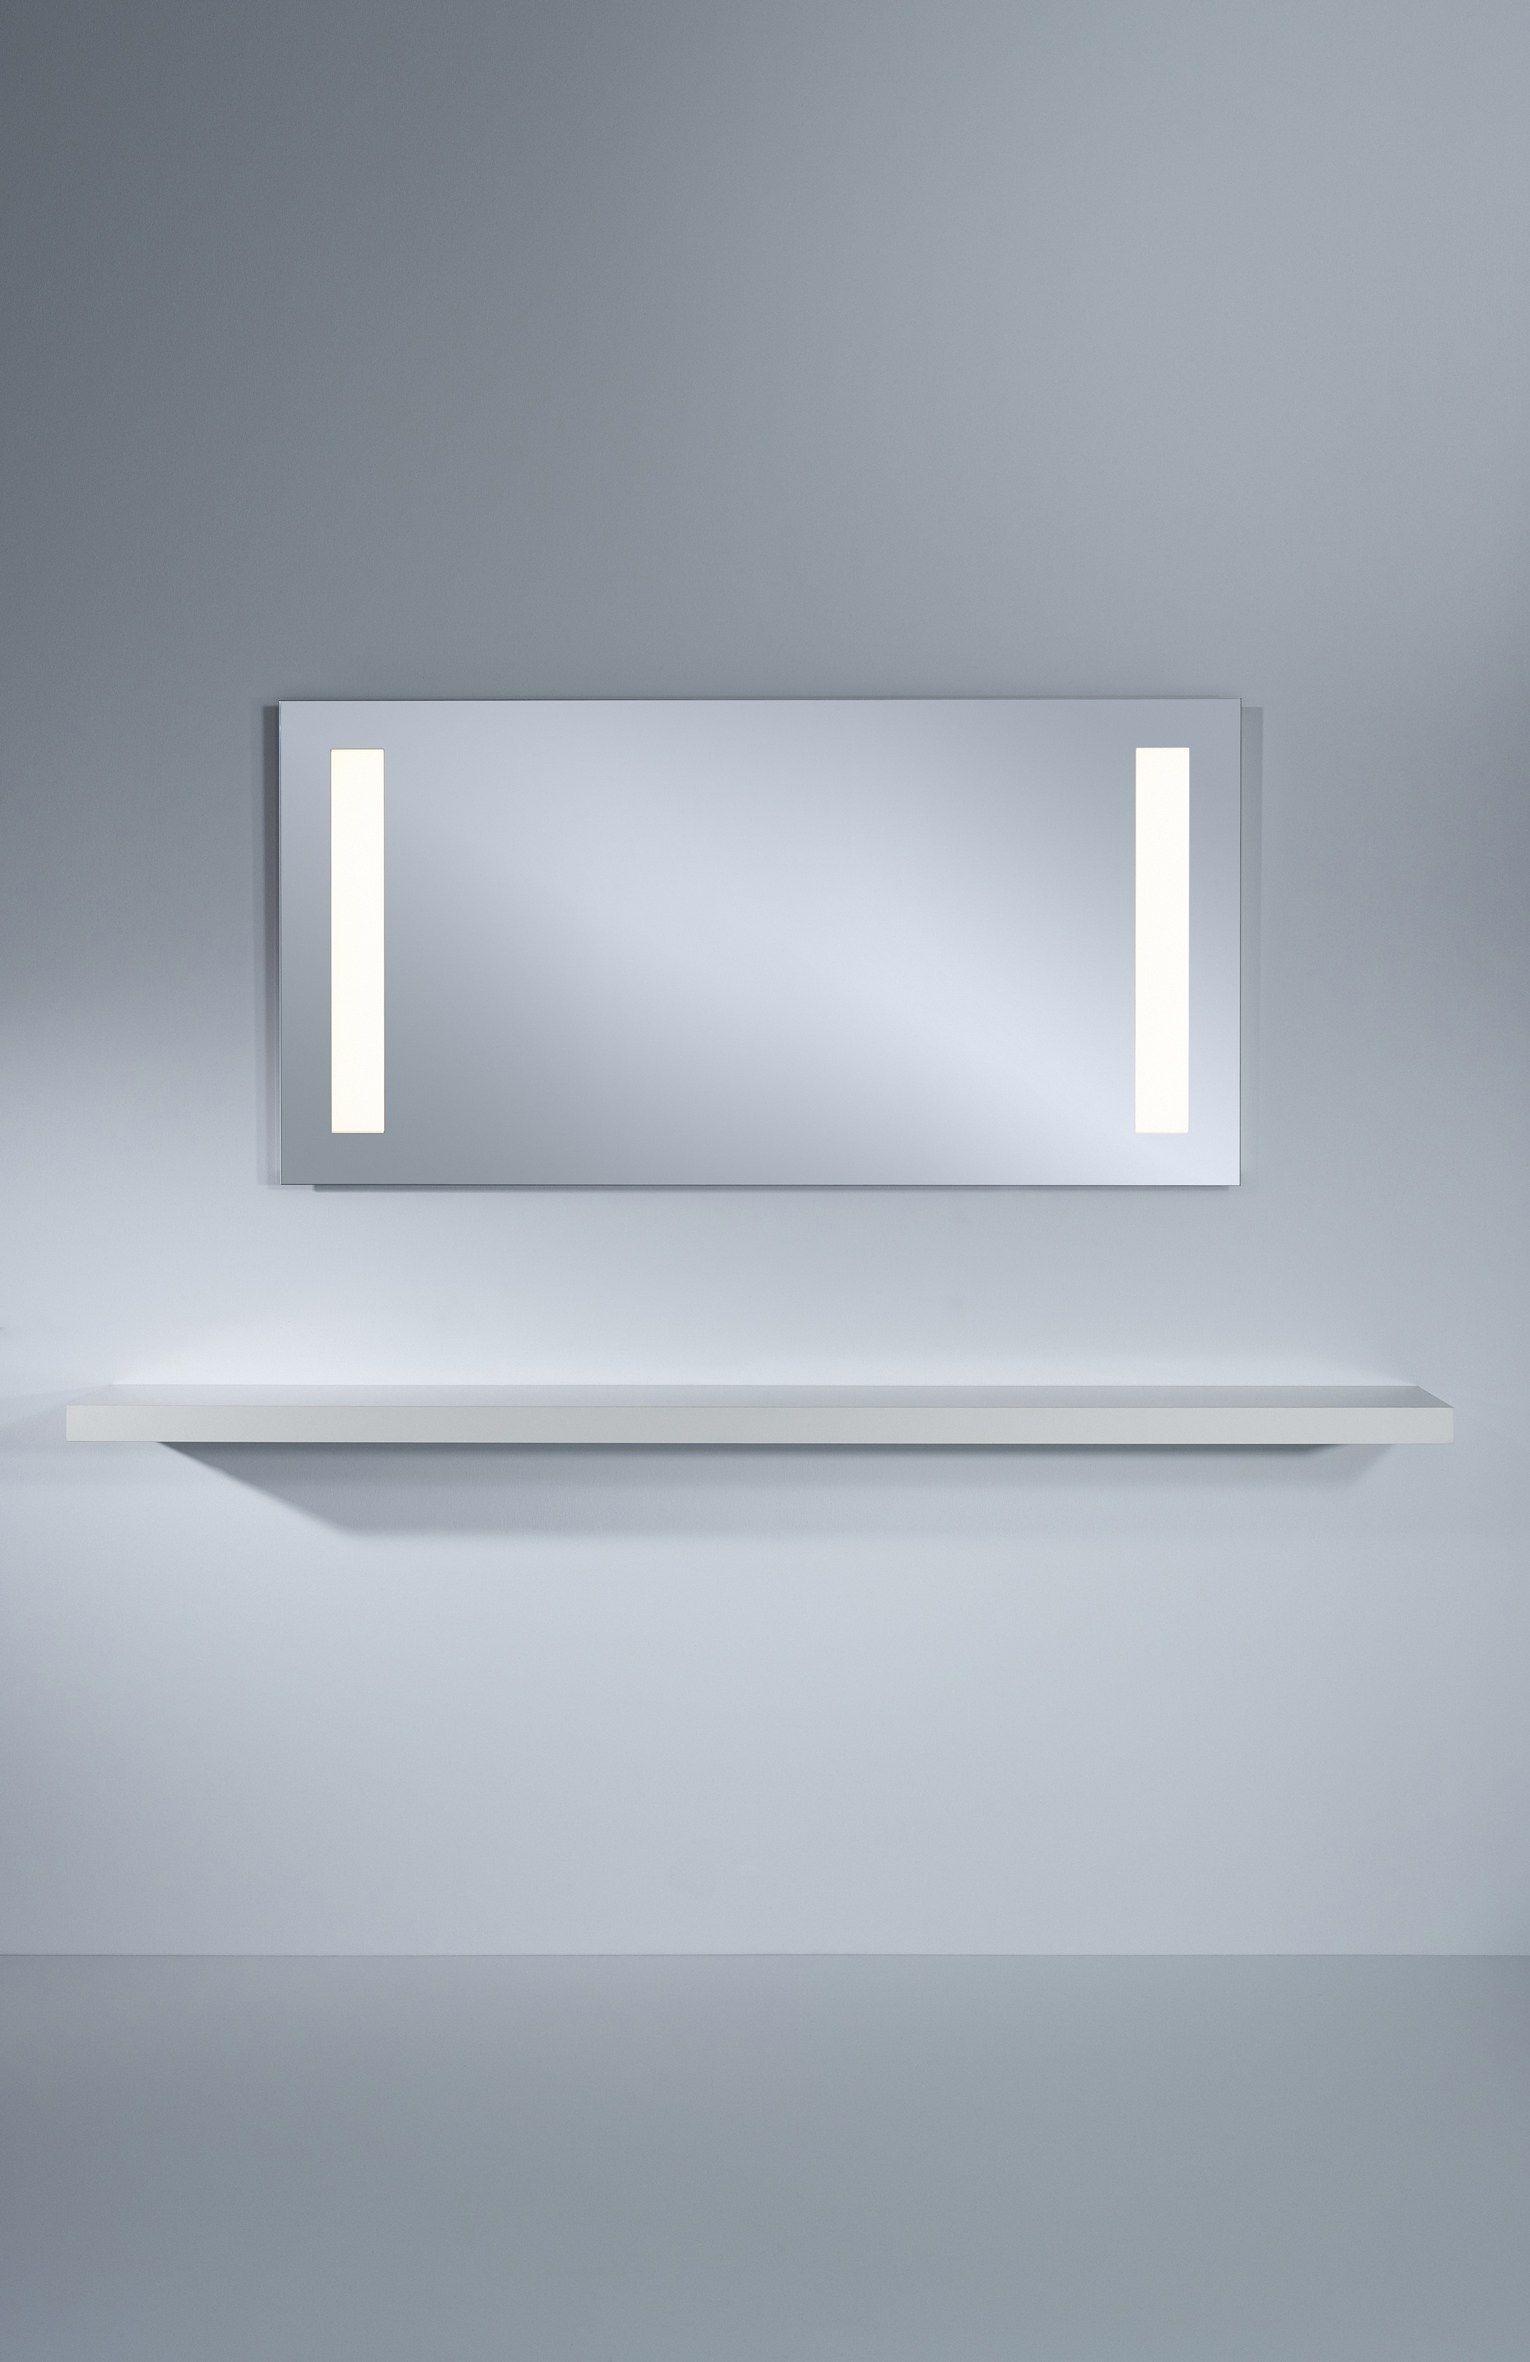 miroir mural avec clairage int gr b pure collection. Black Bedroom Furniture Sets. Home Design Ideas